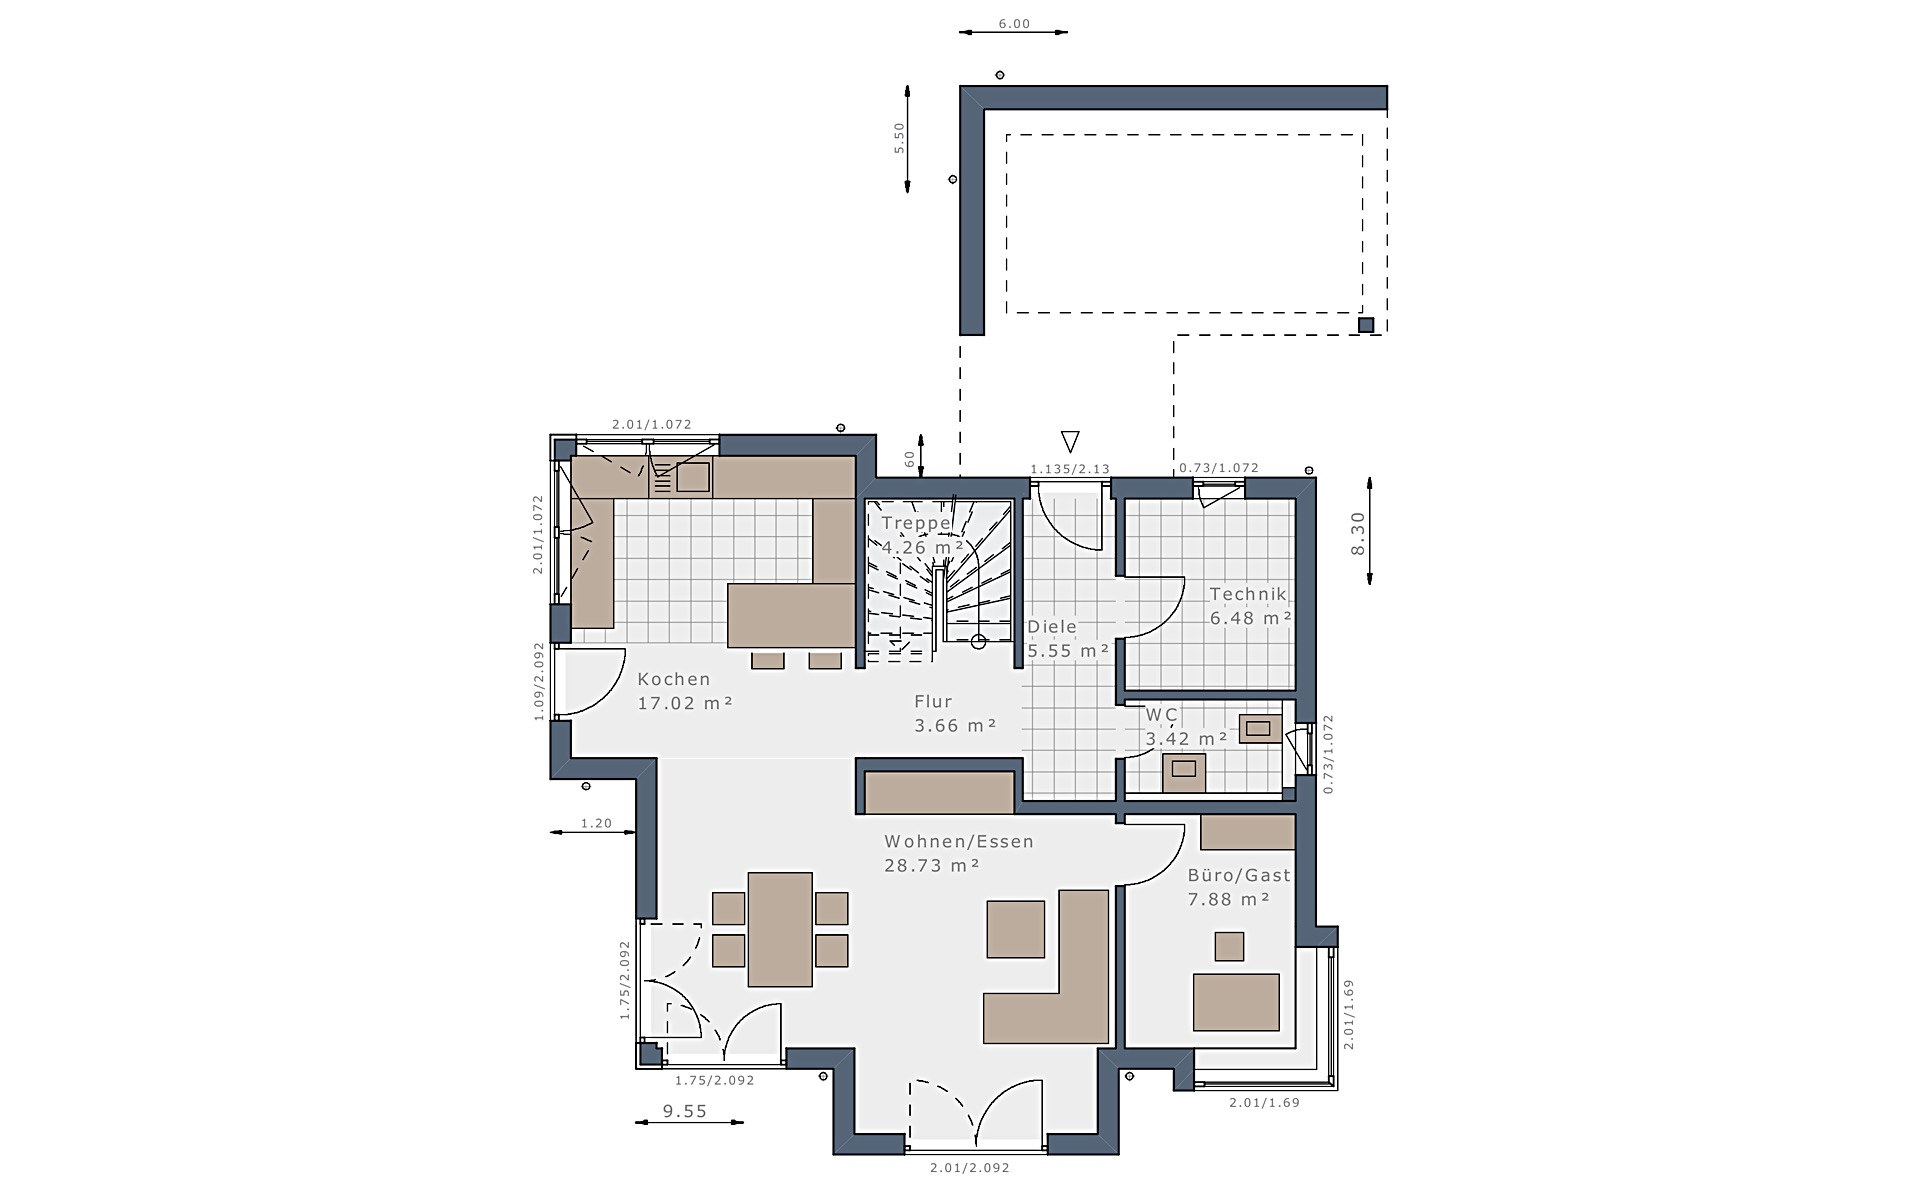 Erdgeschoss Sensation-E-132 E3 von Schwabenhaus GmbH & Co. KG